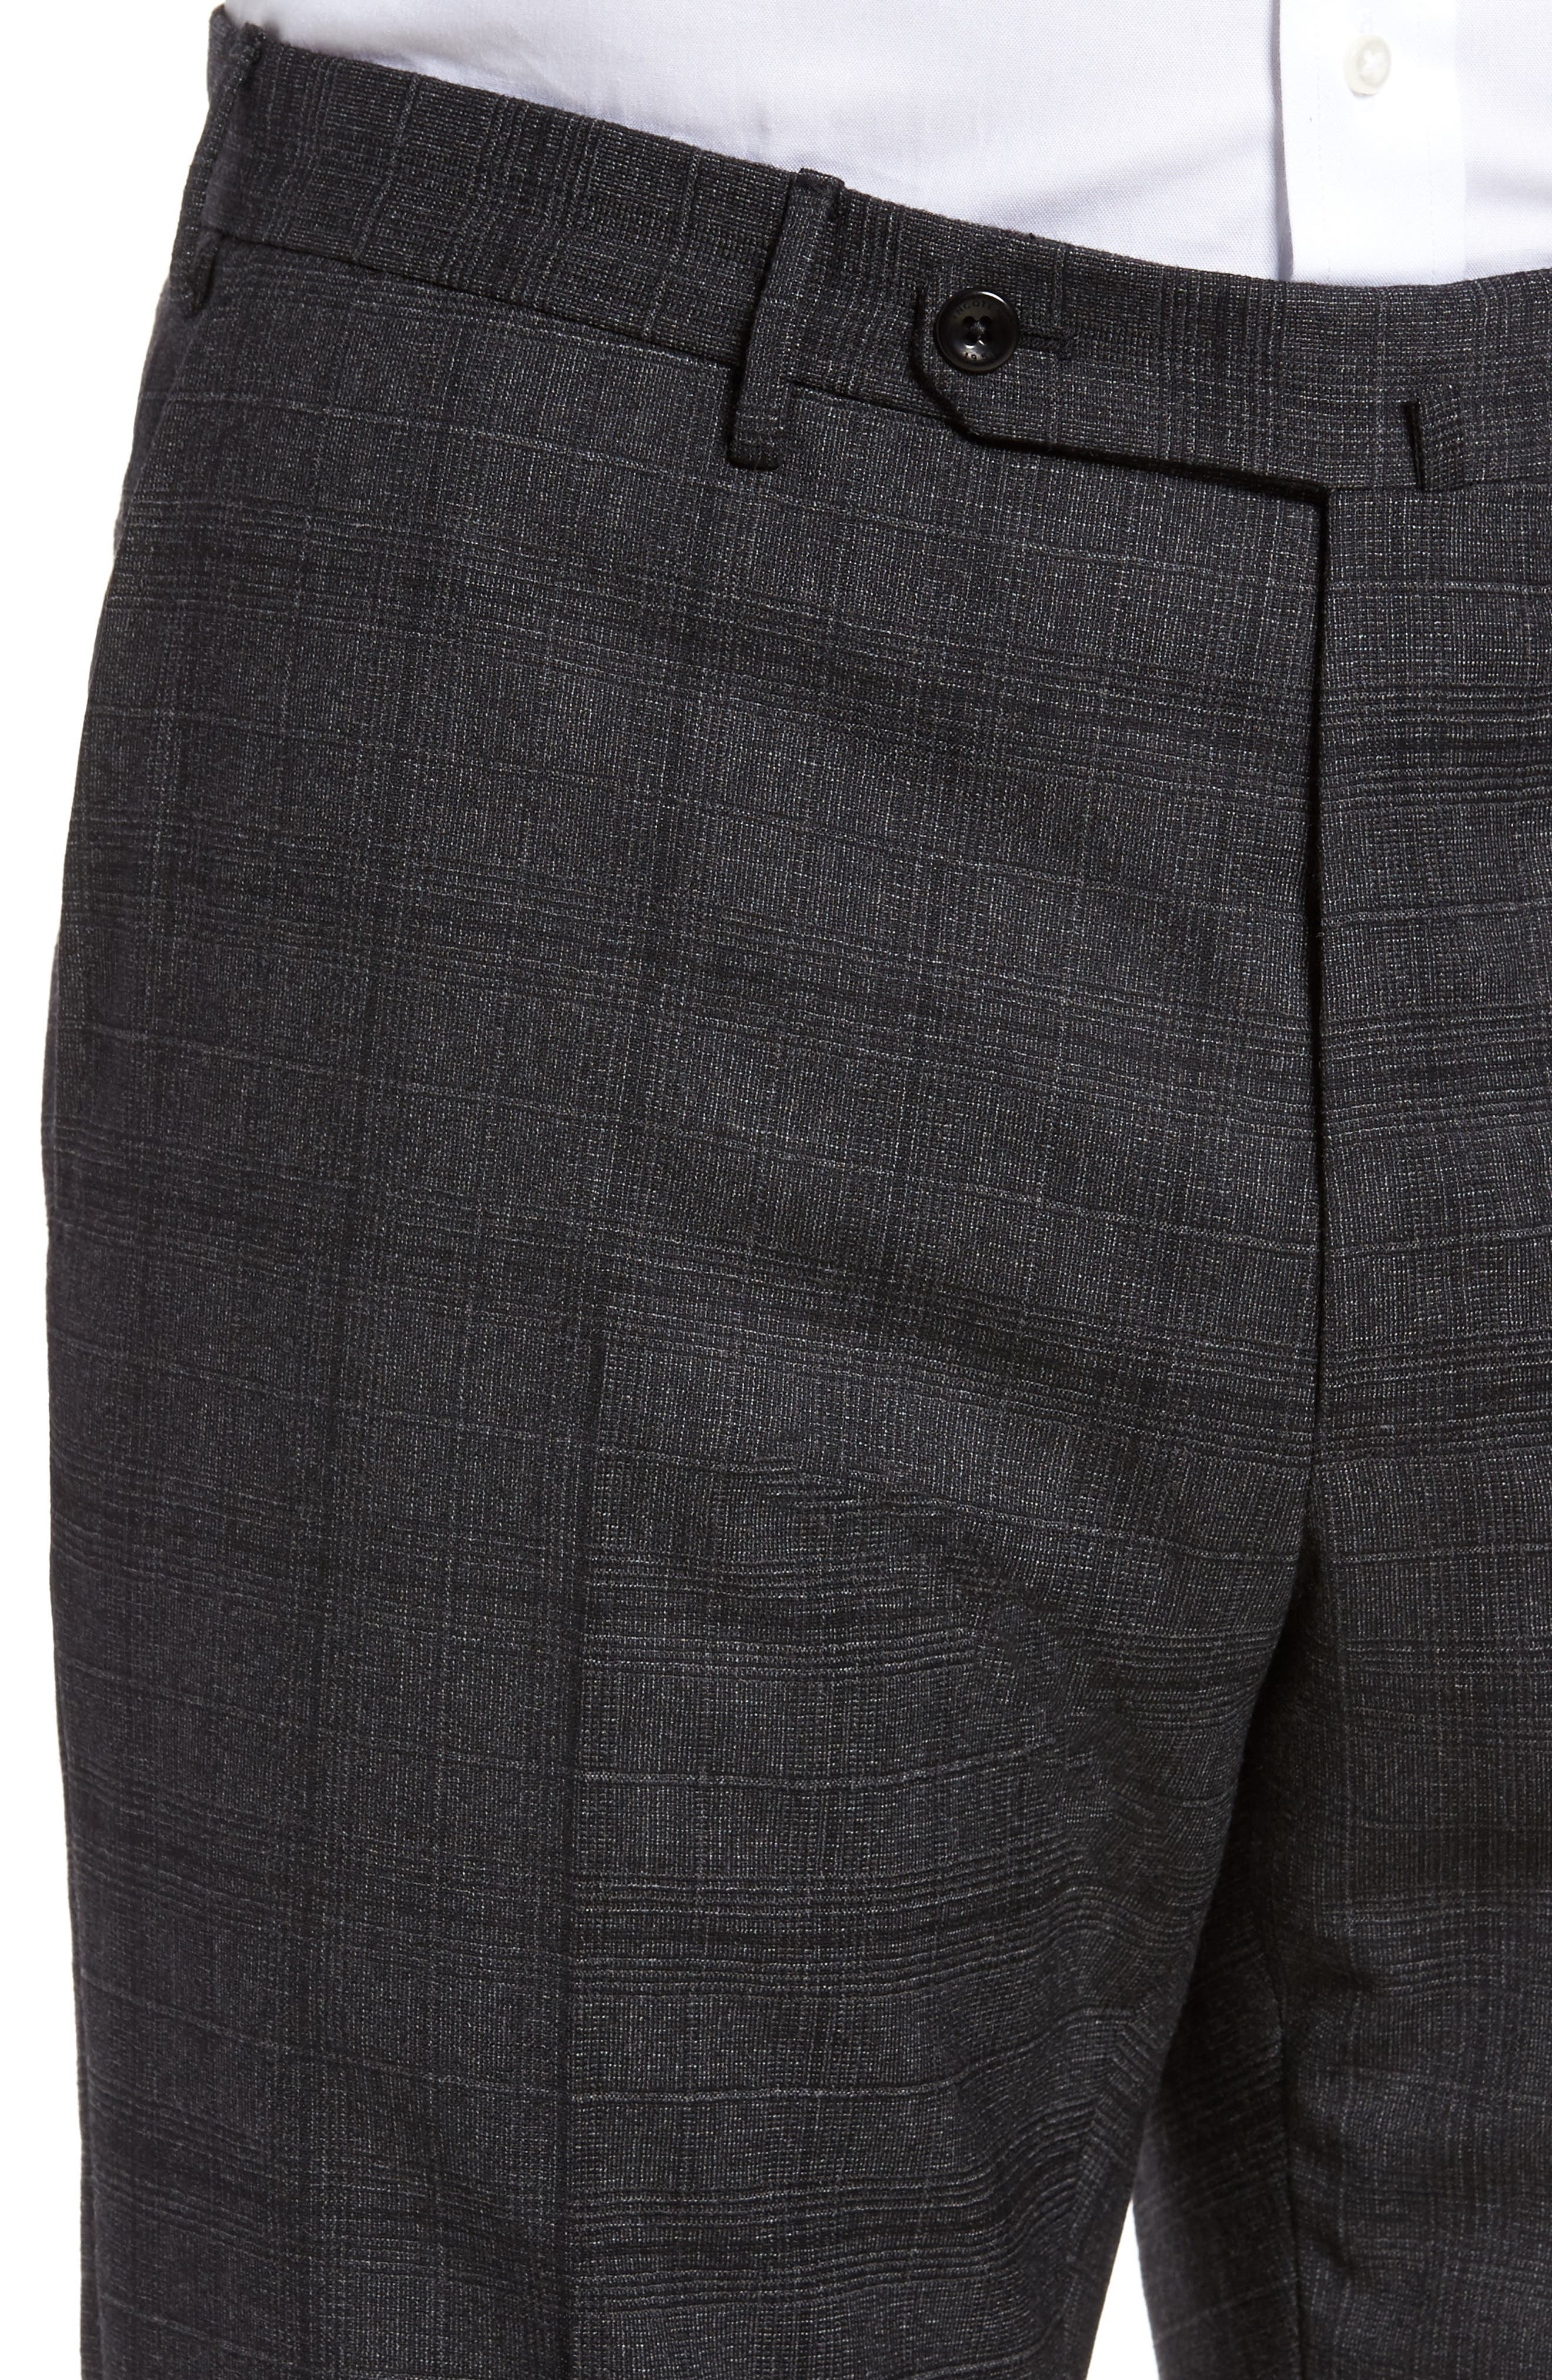 Benson Flat Front Trousers,                             Alternate thumbnail 5, color,                             015